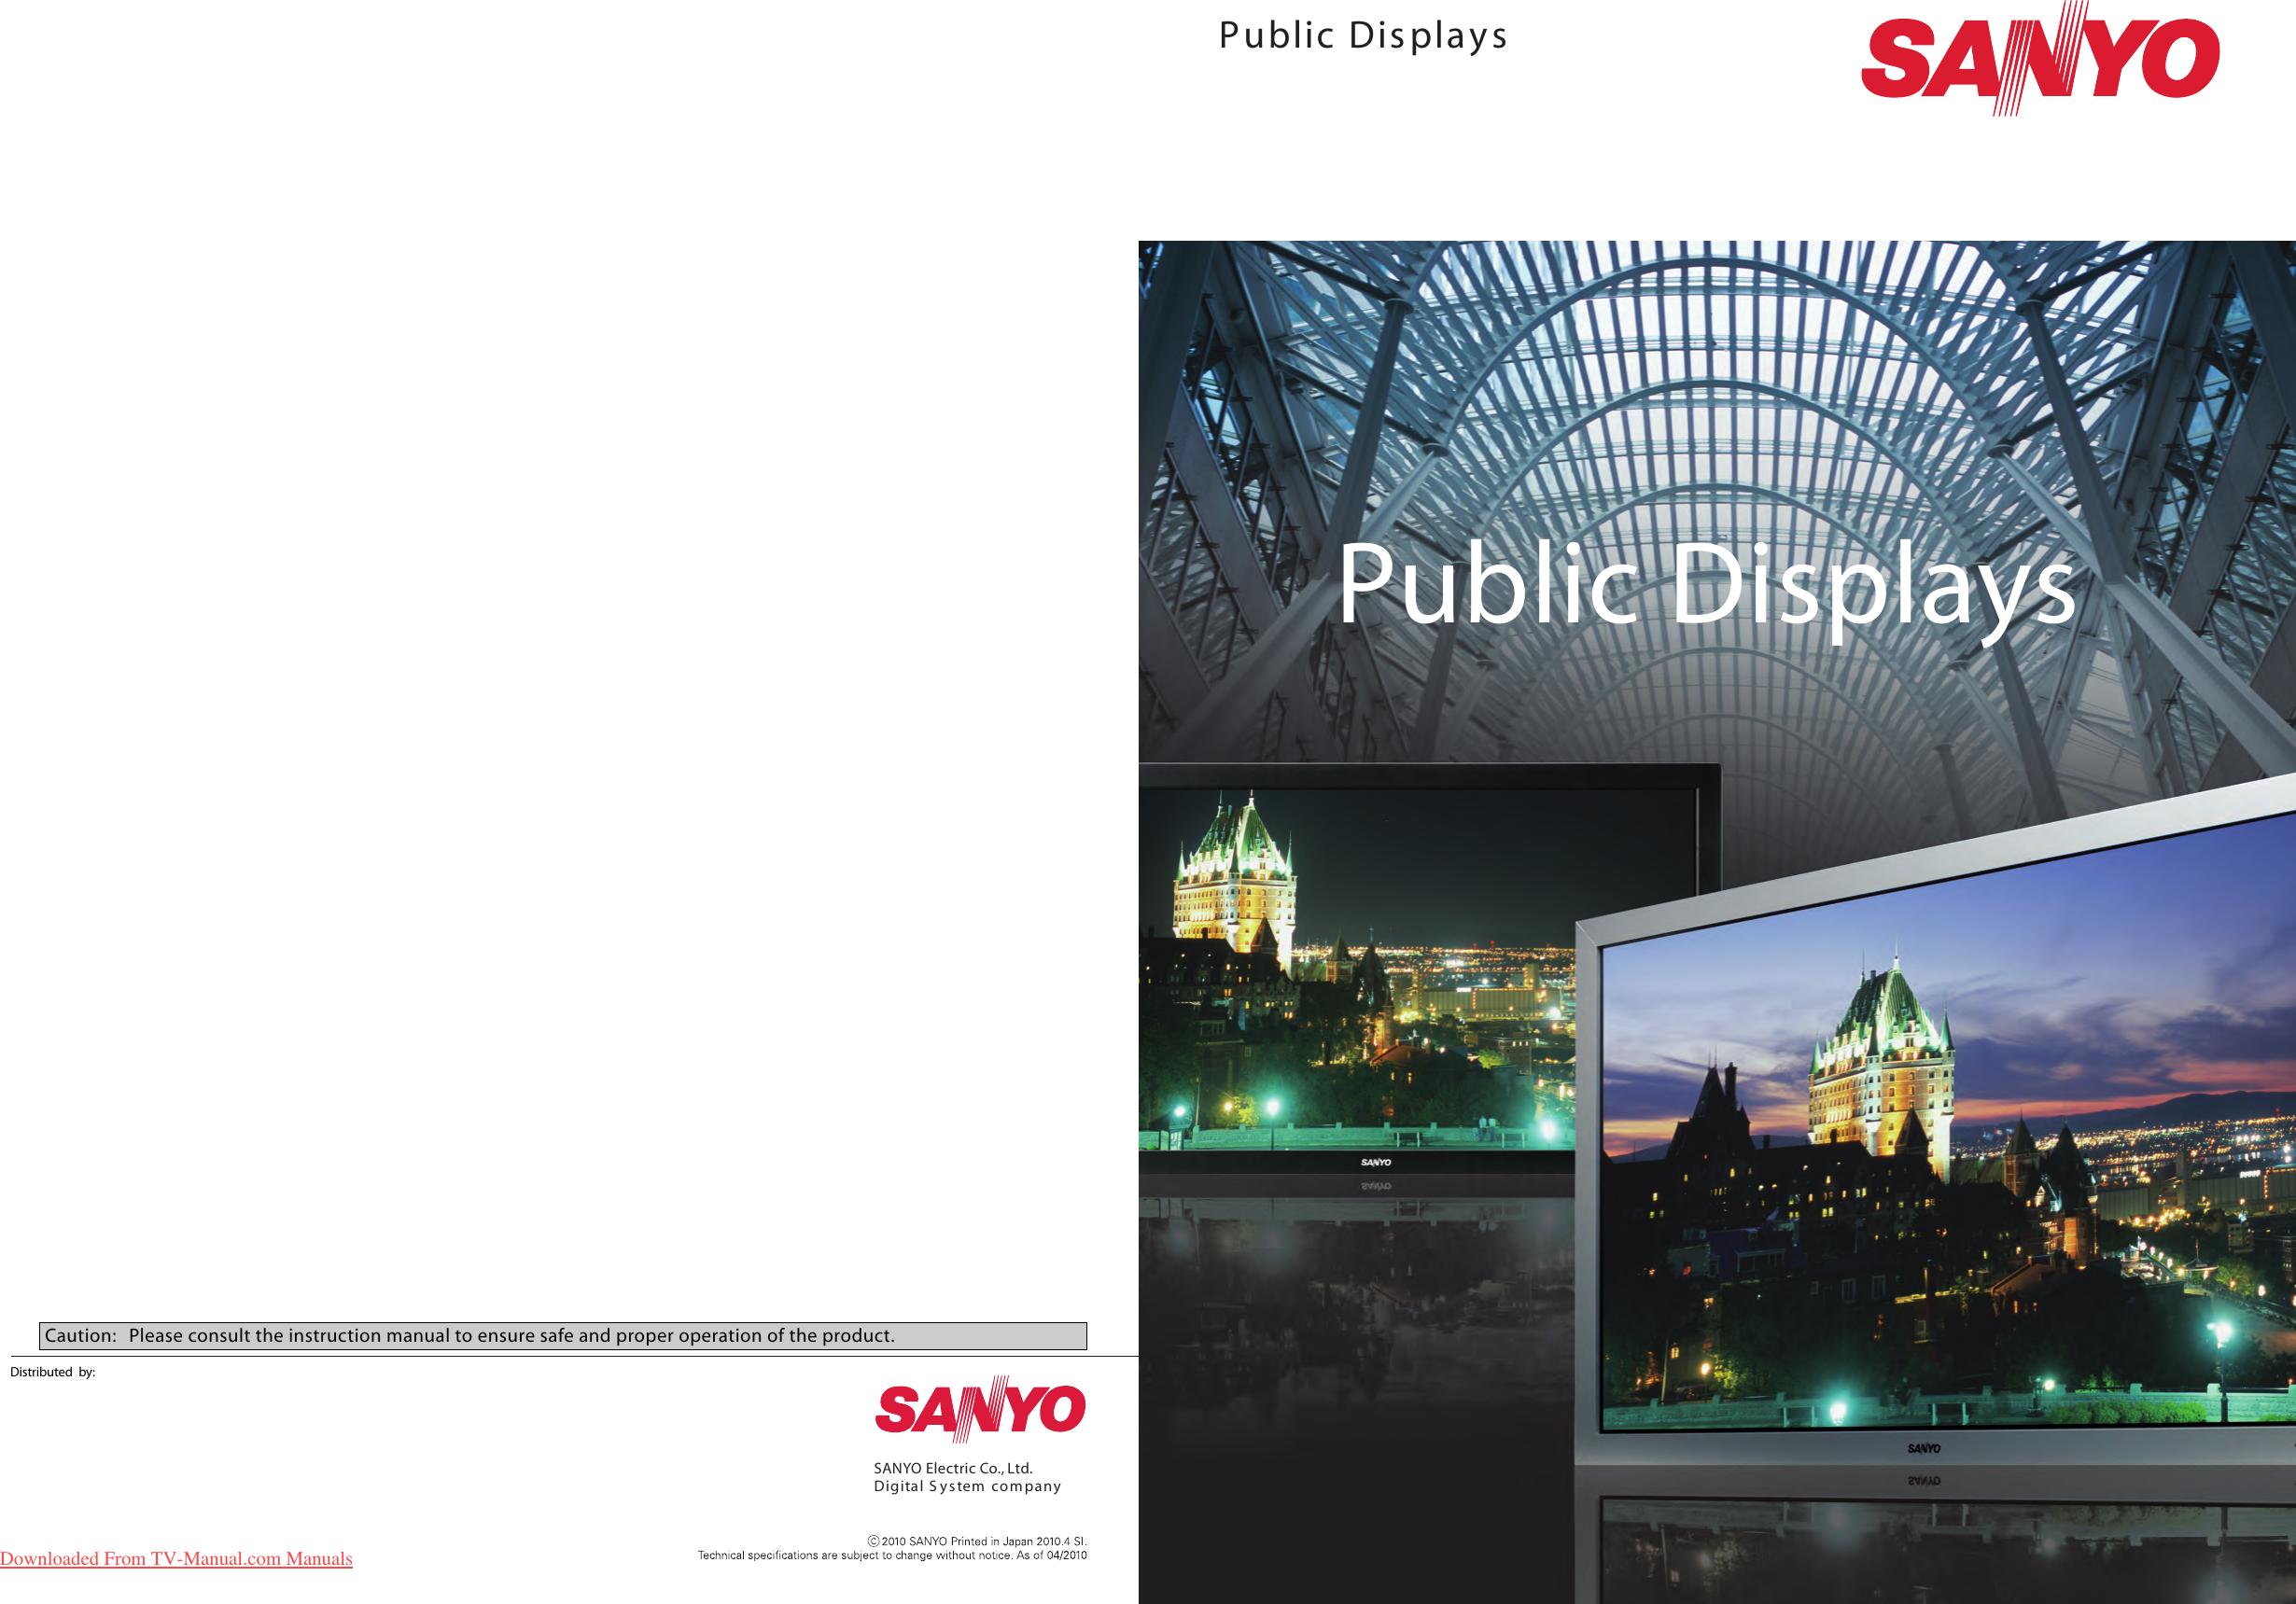 Sanyo 52SR3 42SR4 User Manual Tv Guide Operating Instructions Pdf To